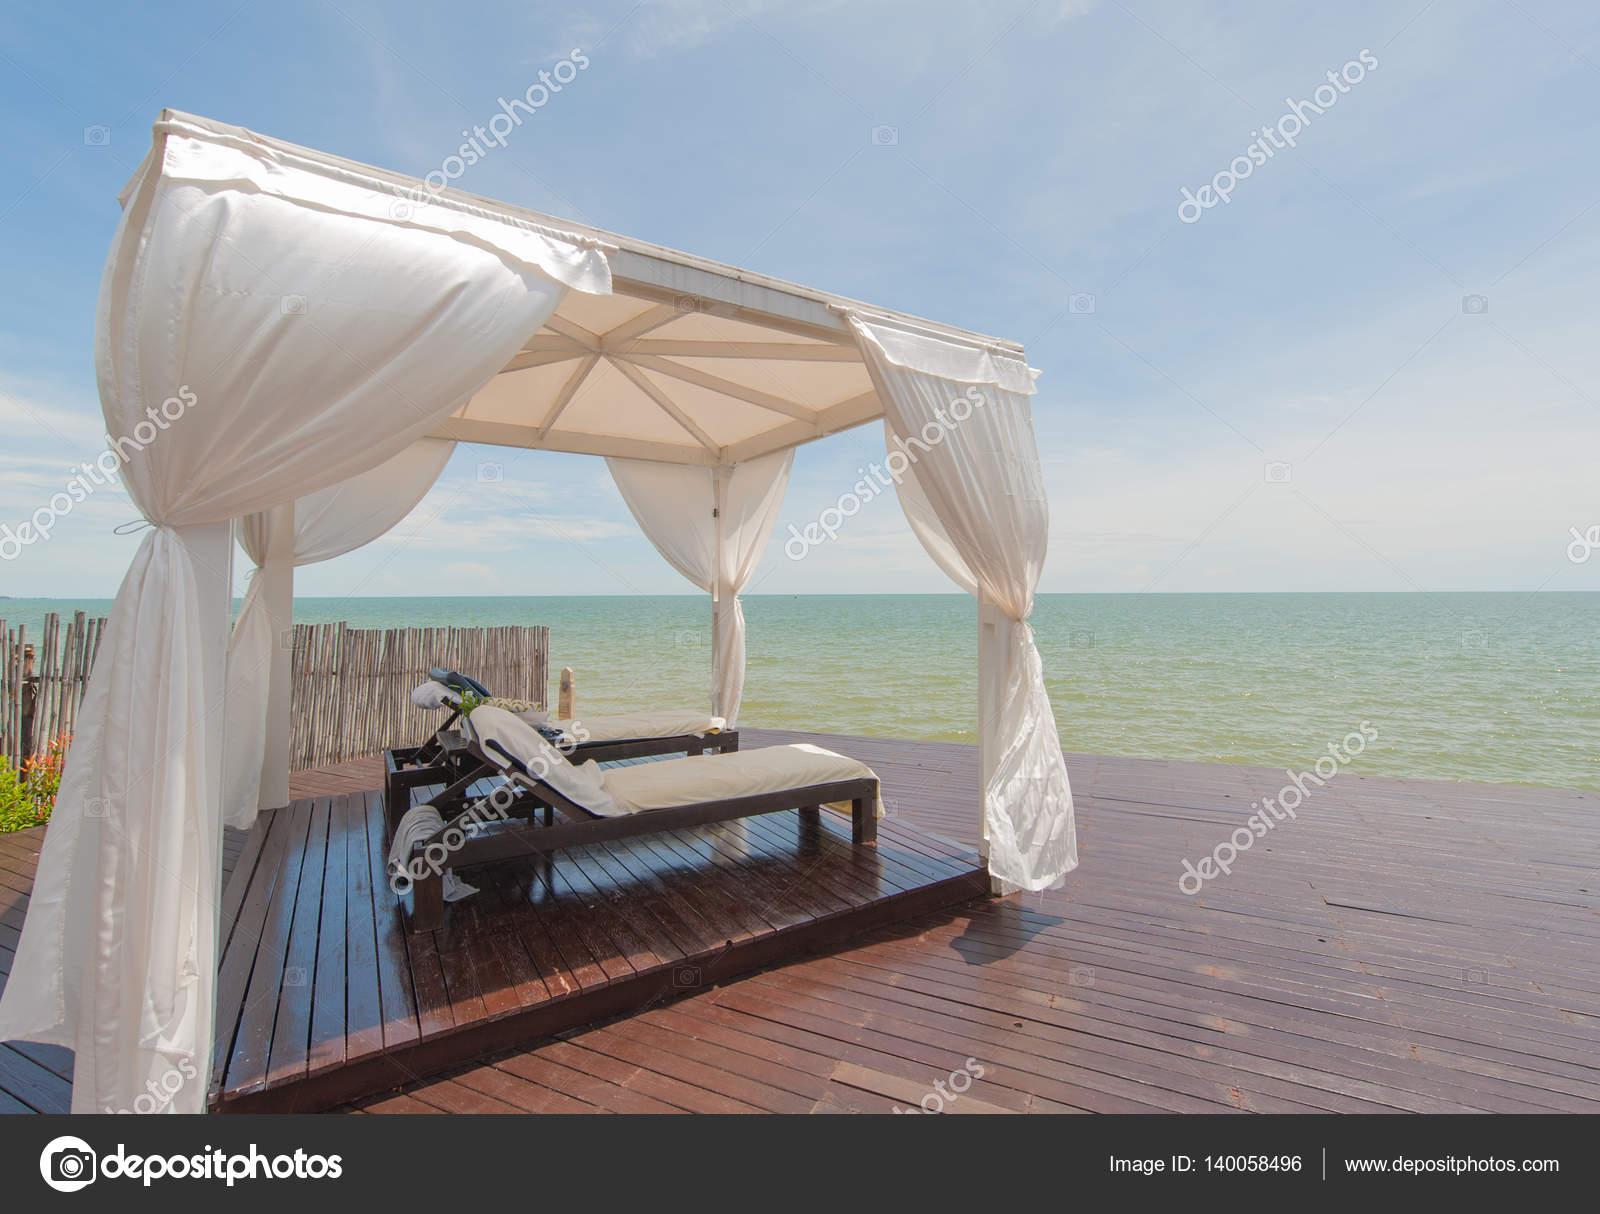 Luxurioses Bett Am Meer Am Strand Im Urlaub Entspannen Stockfoto